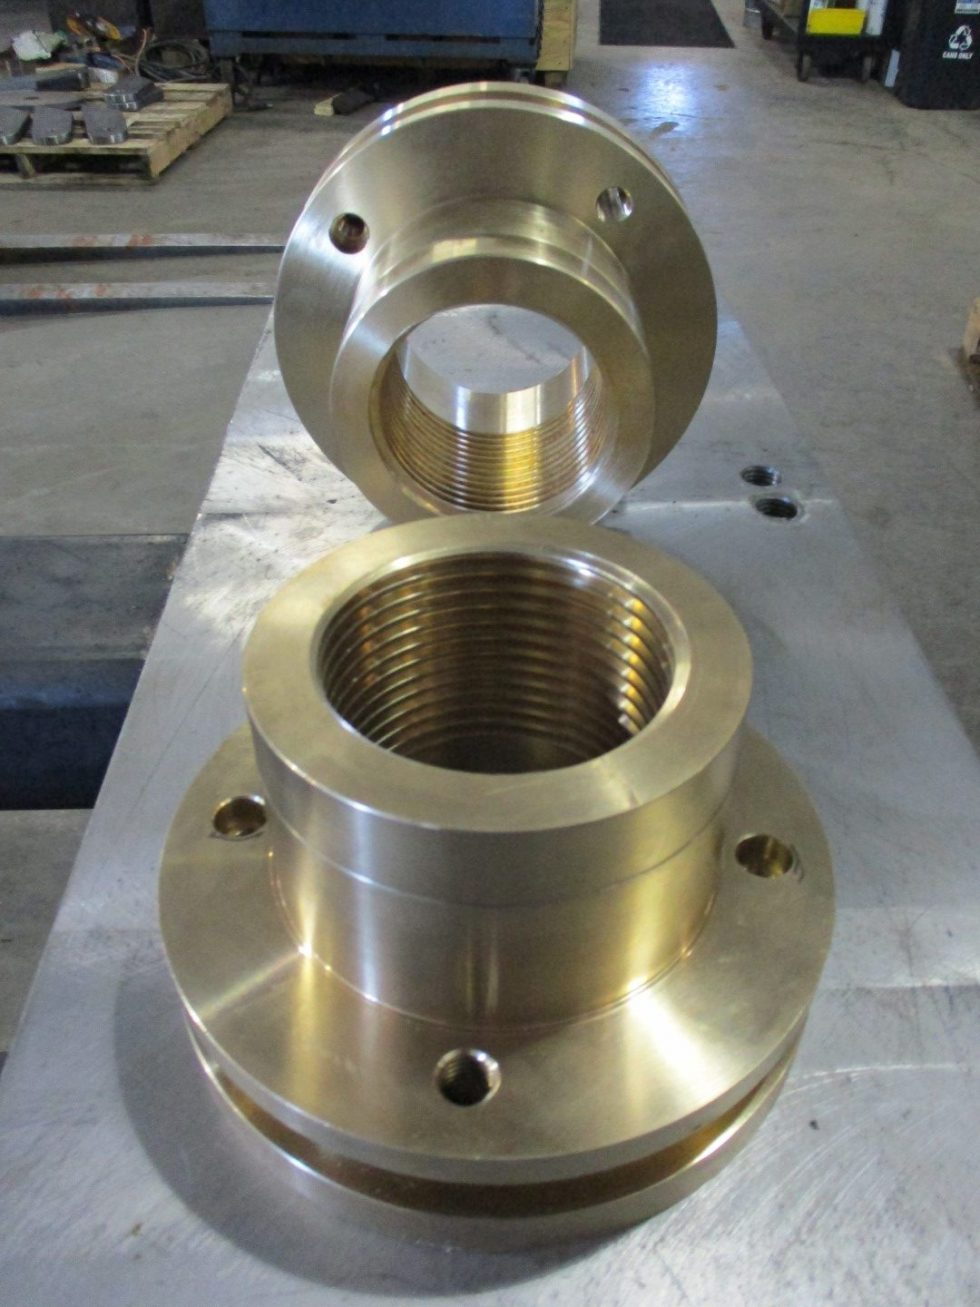 Manufacture Rear Die Height Nut